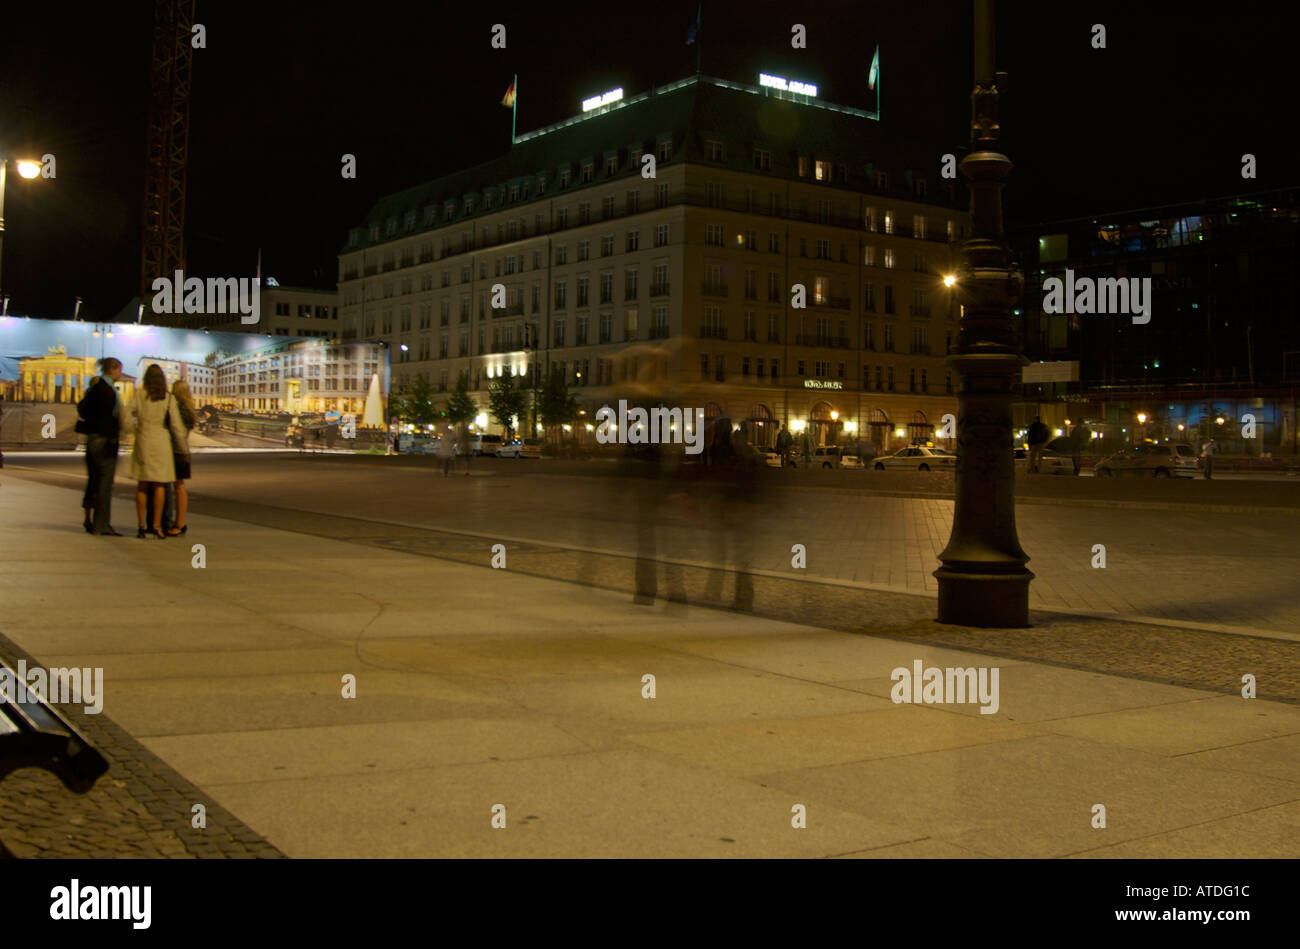 Nightlife Berlin Woman Stock Photos Nightlife Berlin Woman Stock